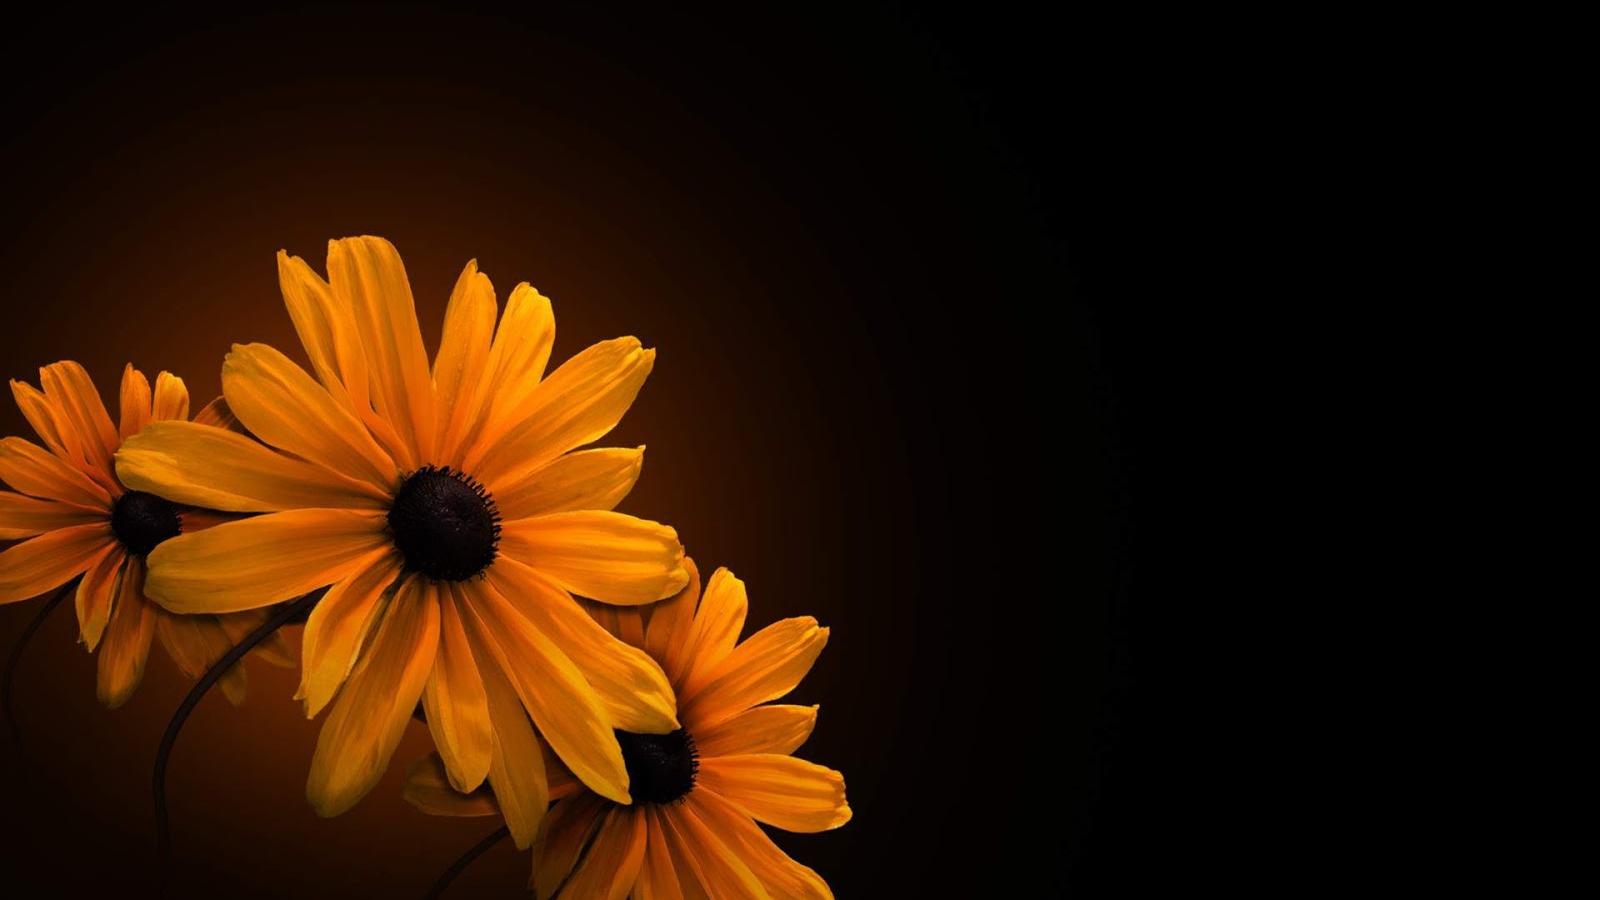 Free Download Flower On Black Background Wallpaper Hd High